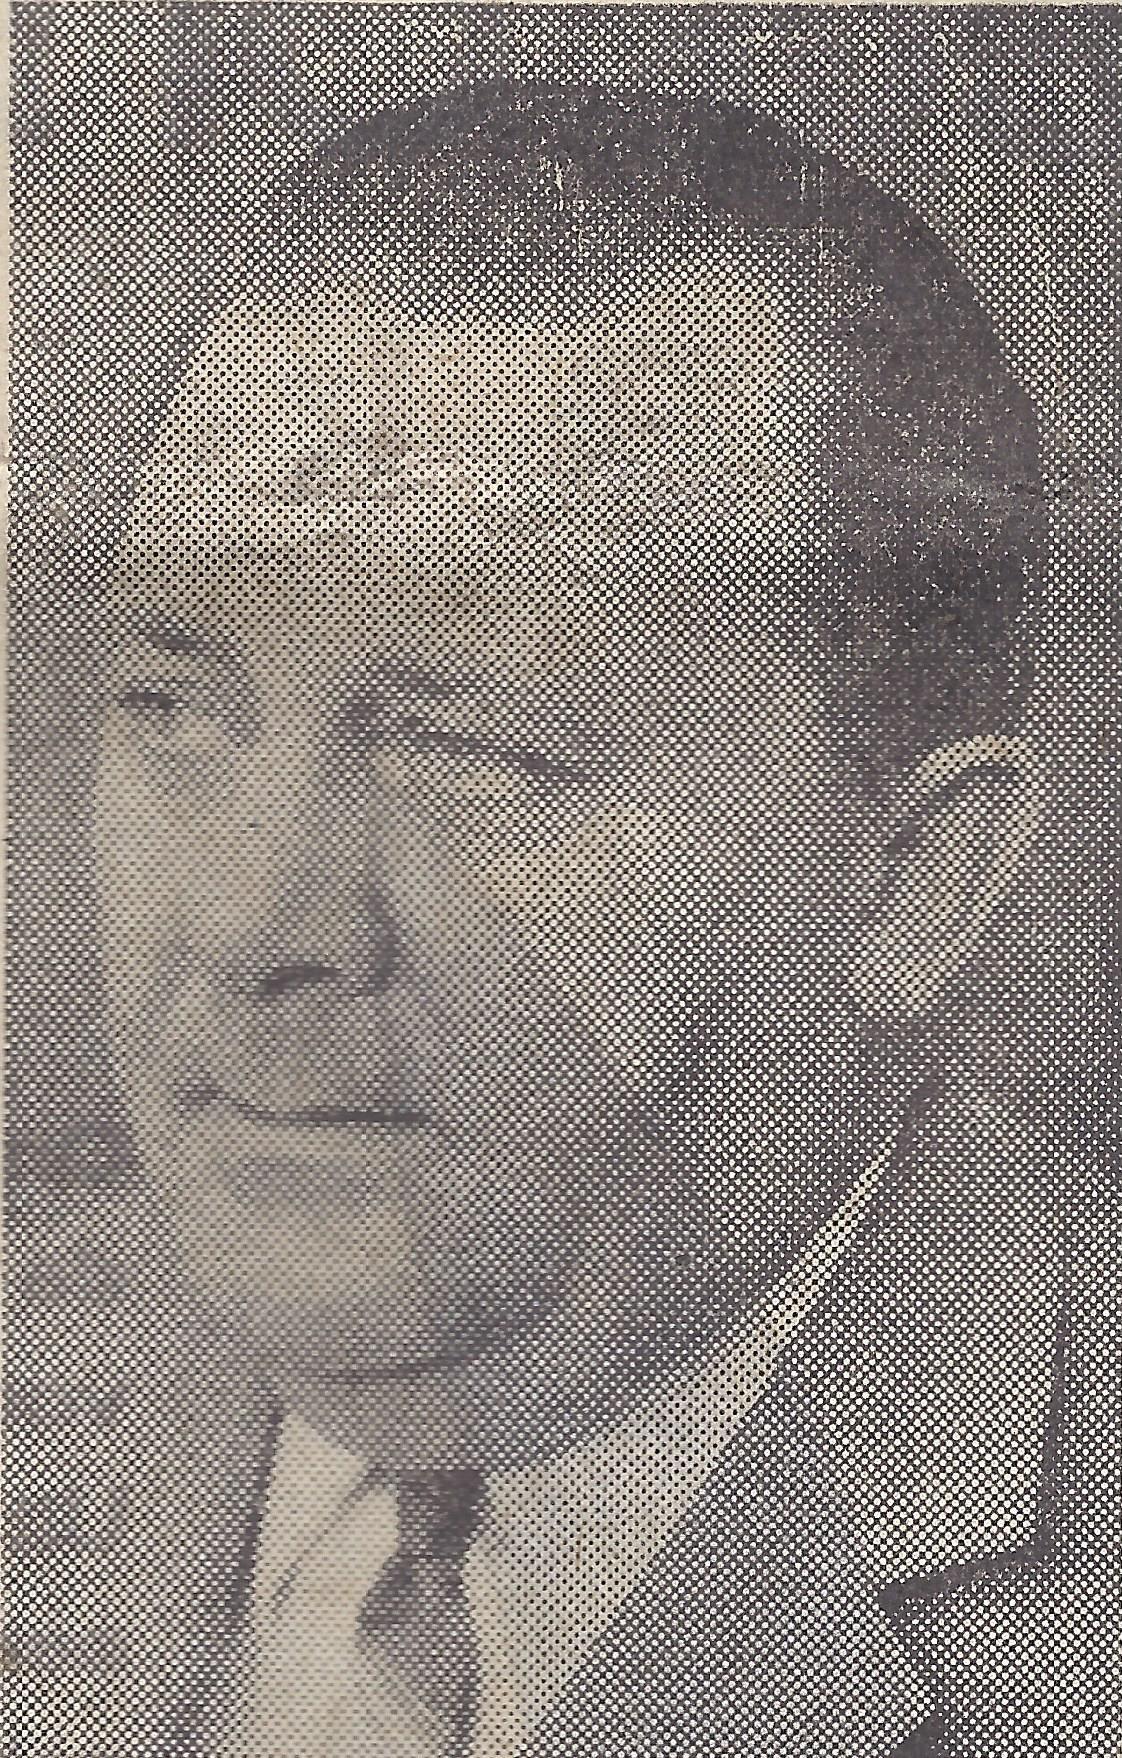 Jaap Boot (1965)